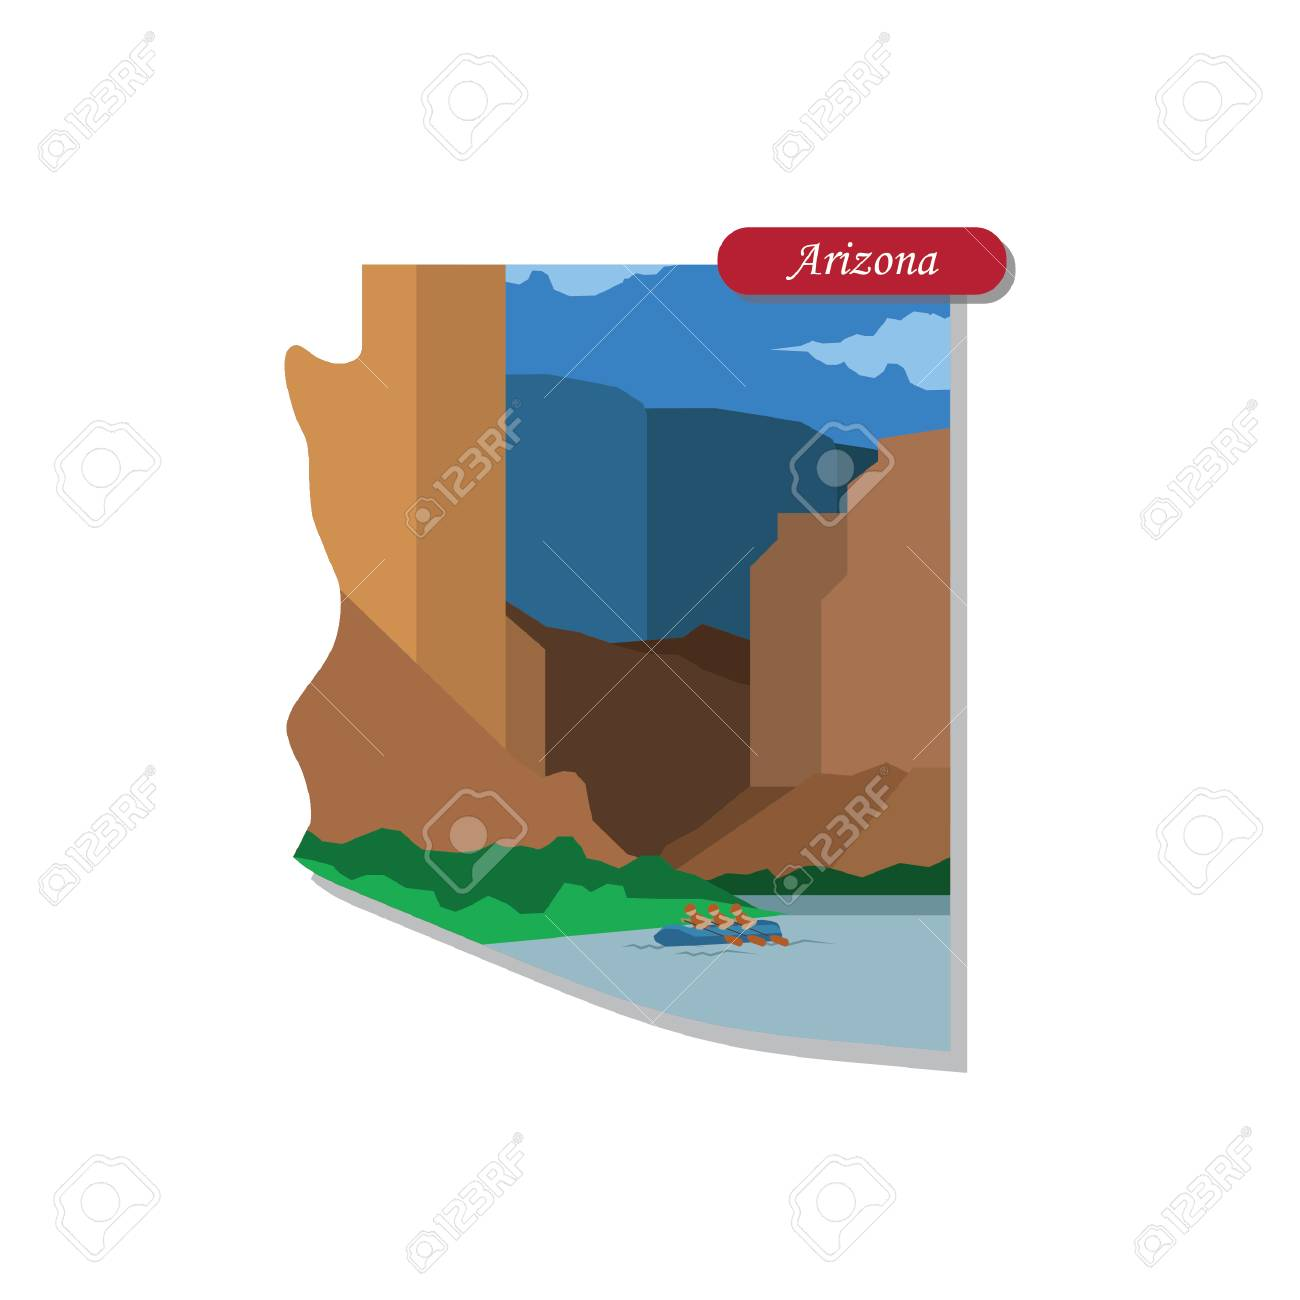 Arizona State Map Free.Arizona State Map Royalty Free Cliparts Vectors And Stock